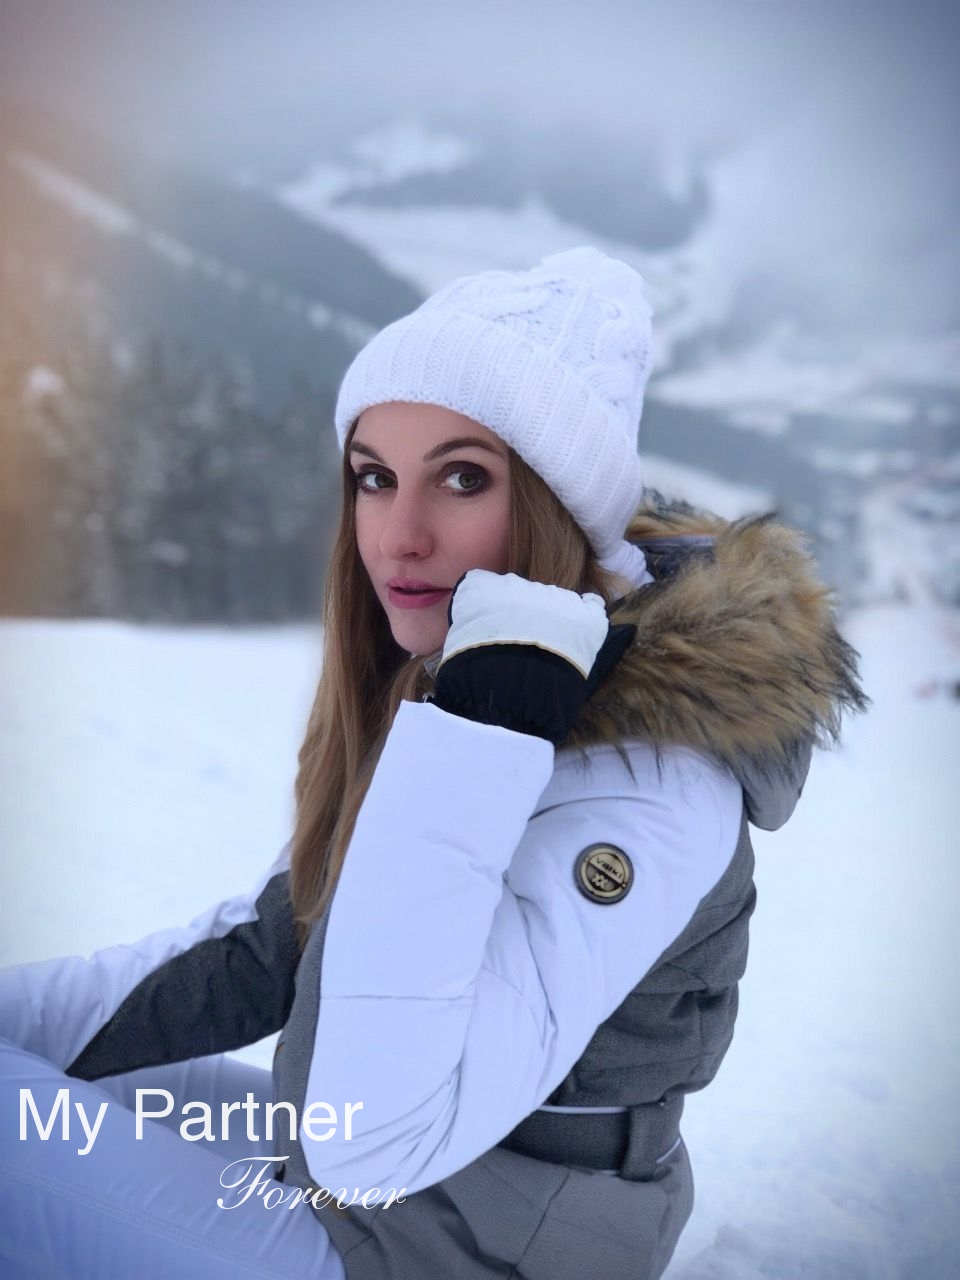 Datingsite to Meet Stunning Ukrainian Girl Elena from Kiev, Ukraine